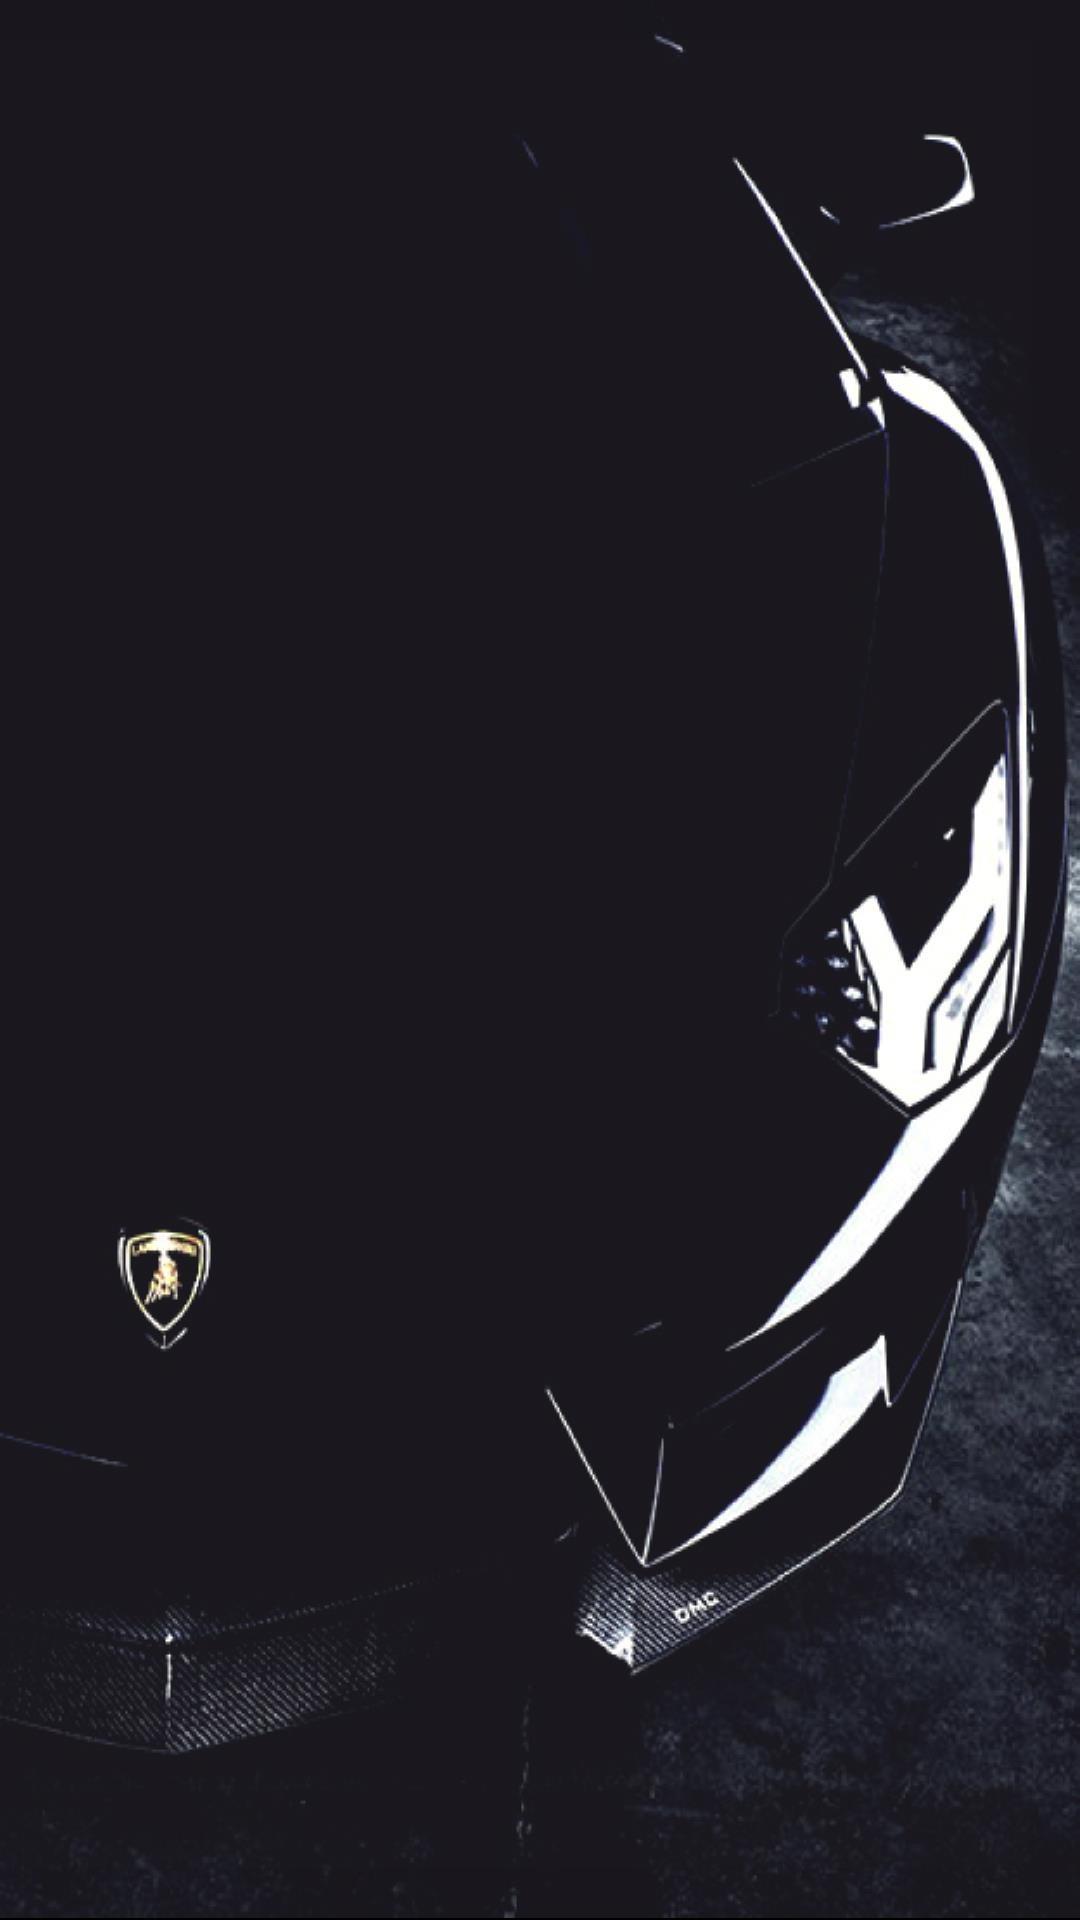 The auto editors of consumer guide lamborghini sports cars are to some th. View Lamborghini Hd Wallpapers 1080p For Mobile Background Picture Idokeren